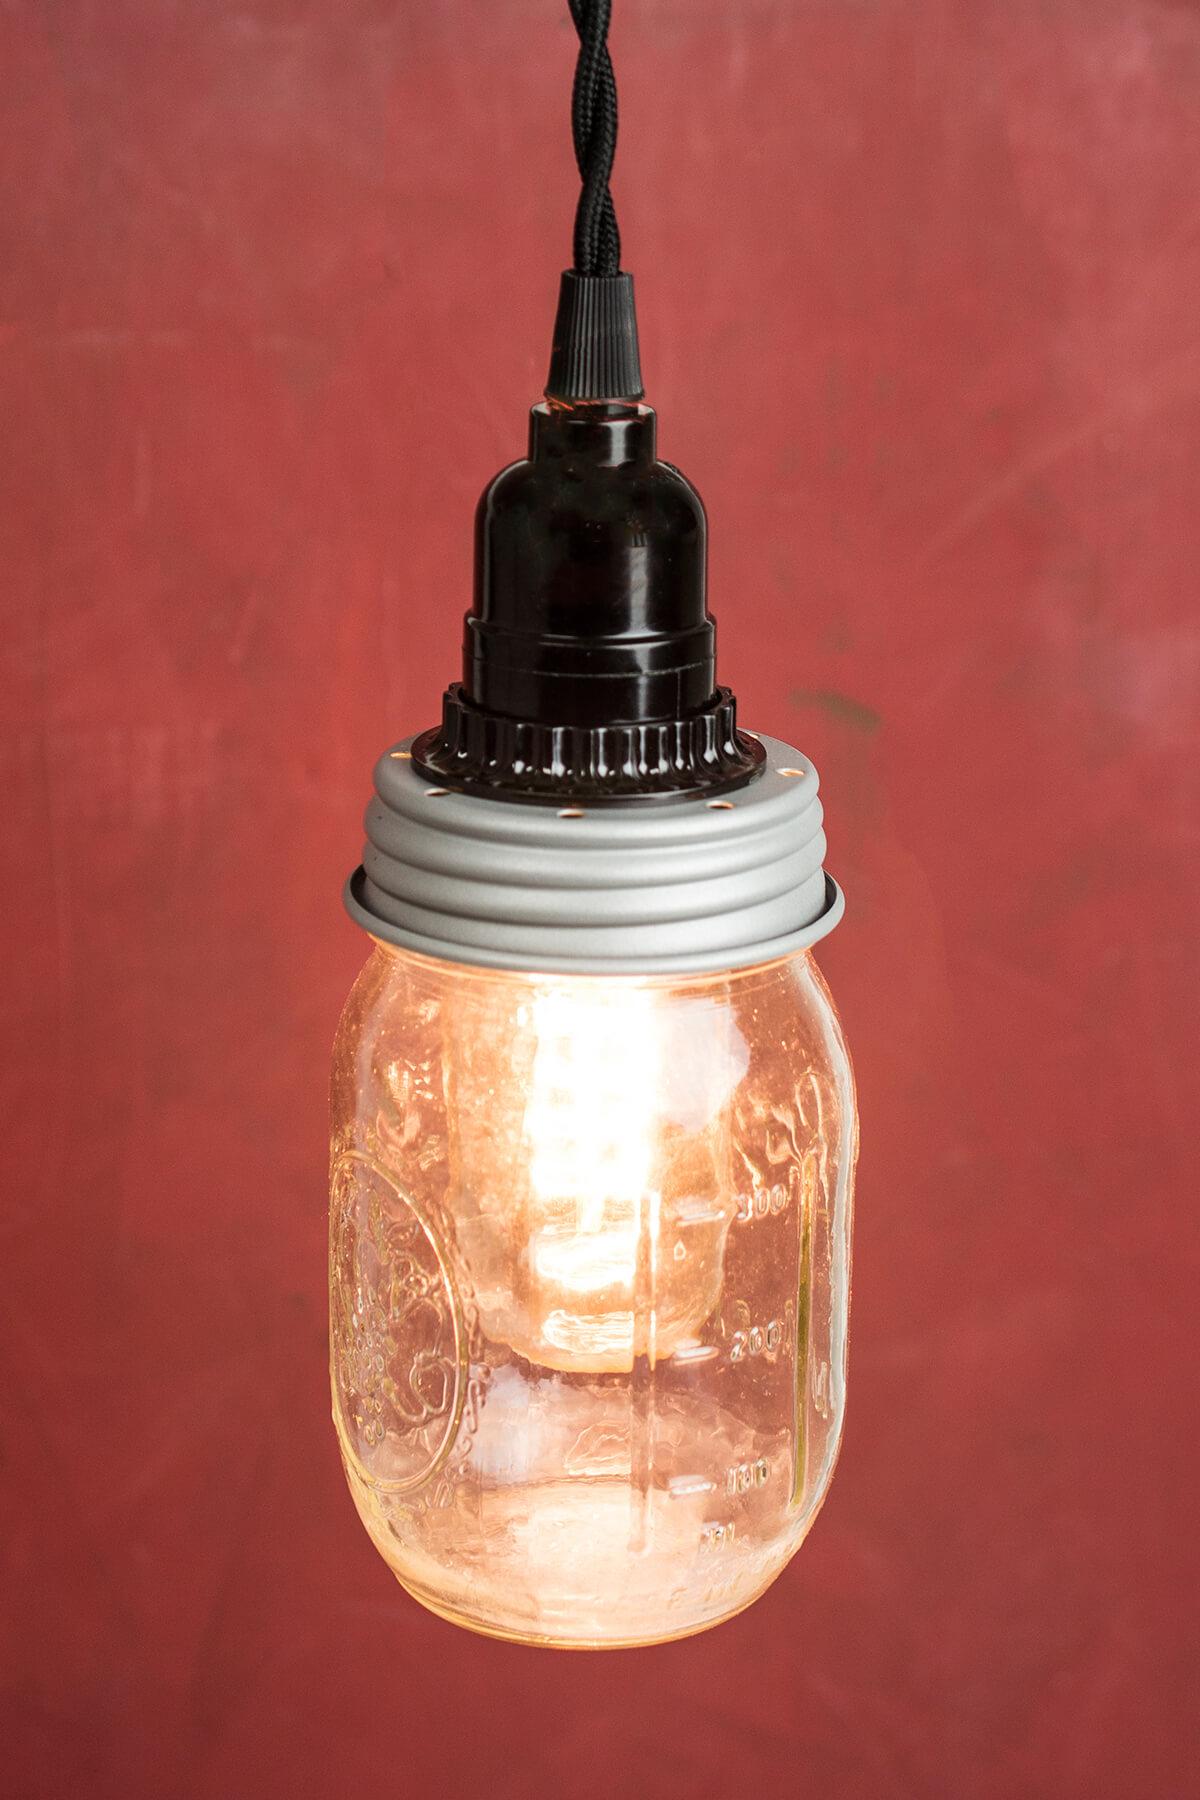 Cleveland Vintage Lighting Mason Jar Adapter Socket Cord